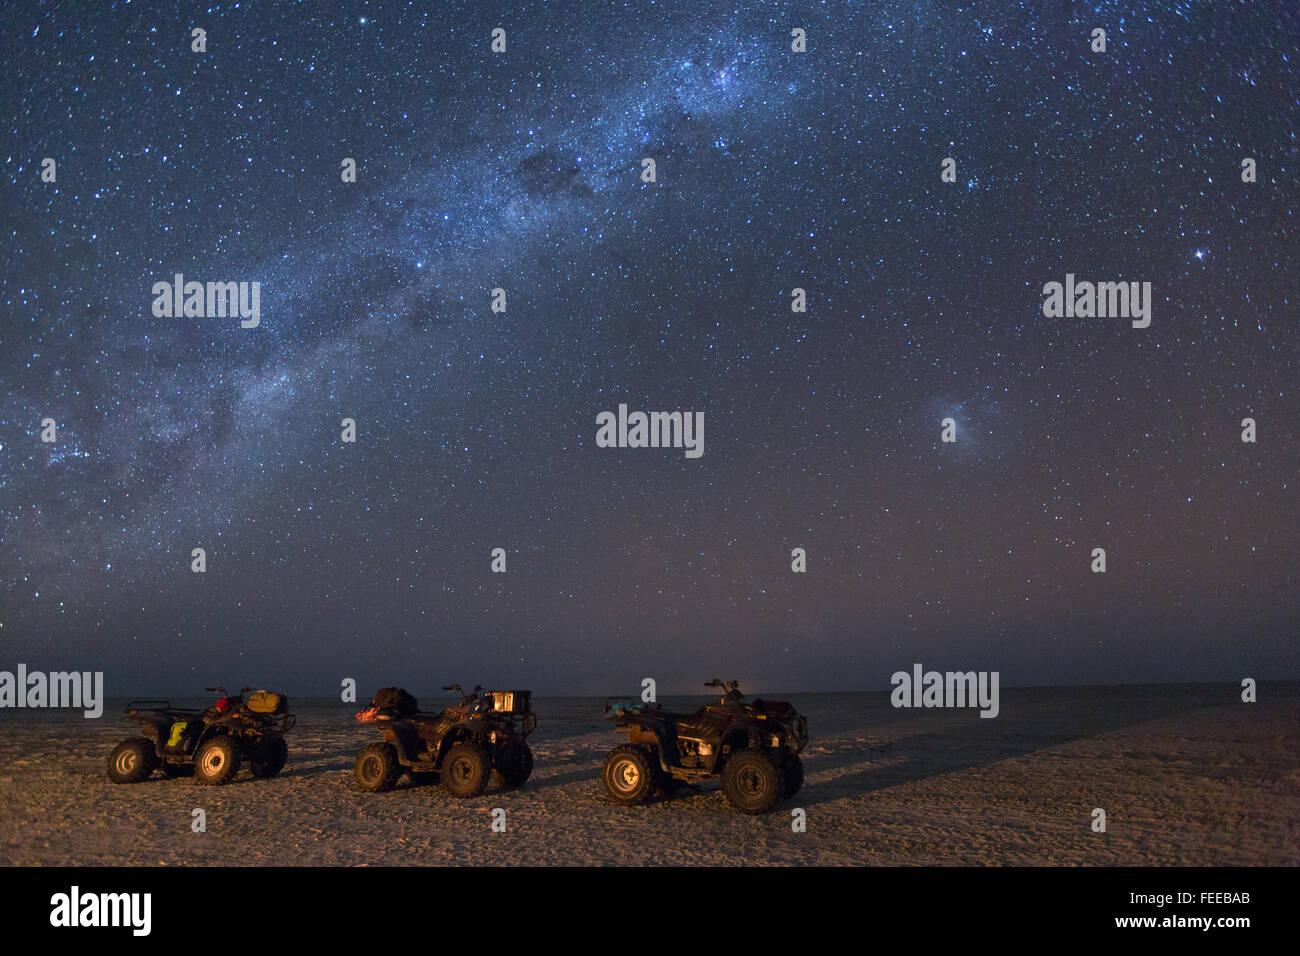 Quad Bikes under the stars - Stock Image